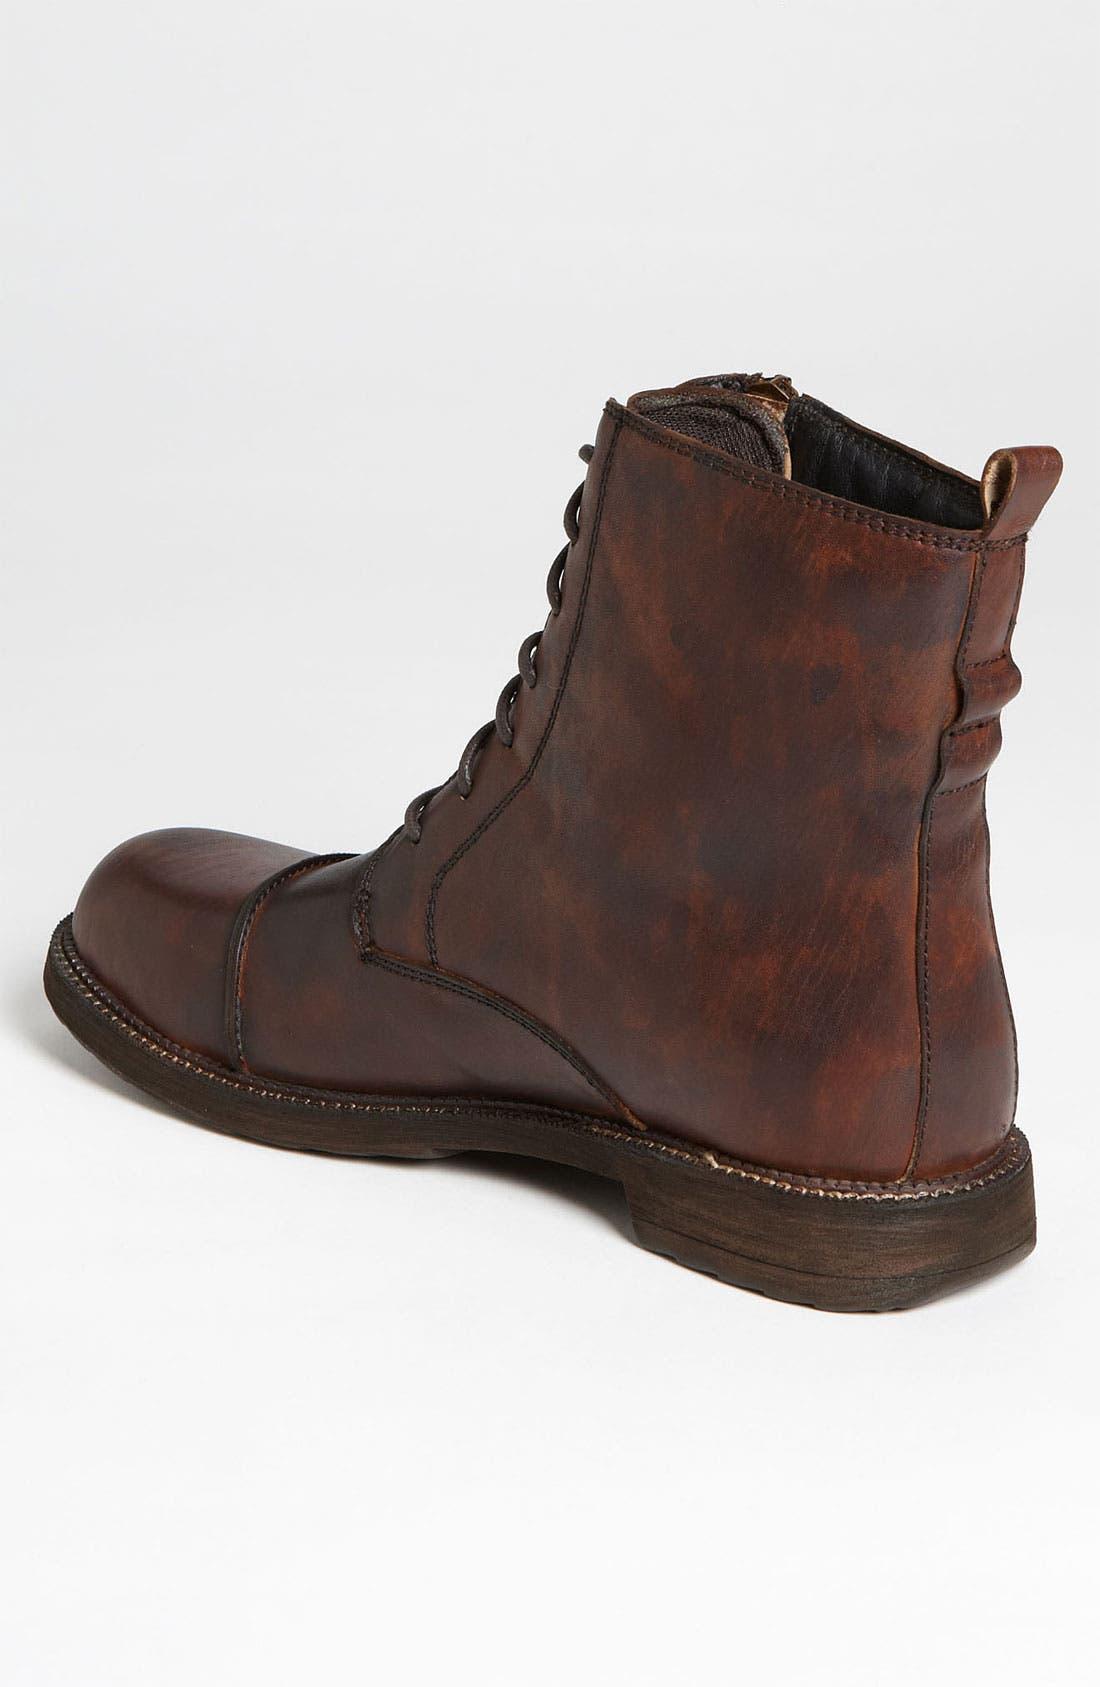 Alternate Image 2  - Bed Stu 'Patriot' Cap Toe Boot (Men)